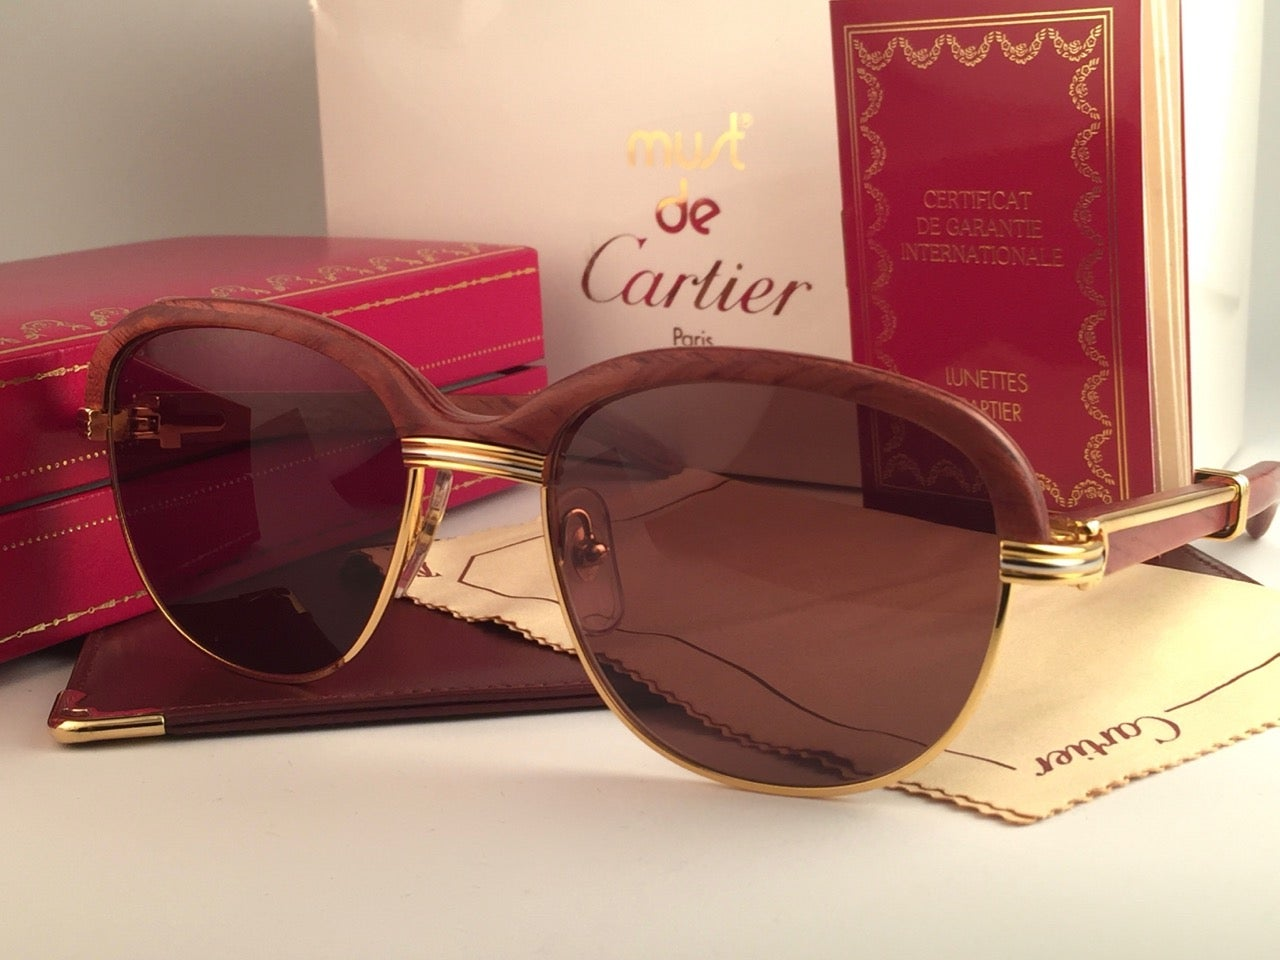 55d99b8492 New Cartier Wood Malmaison Precious Wood Palisander and Gold 56mm  Sunglasses at 1stdibs